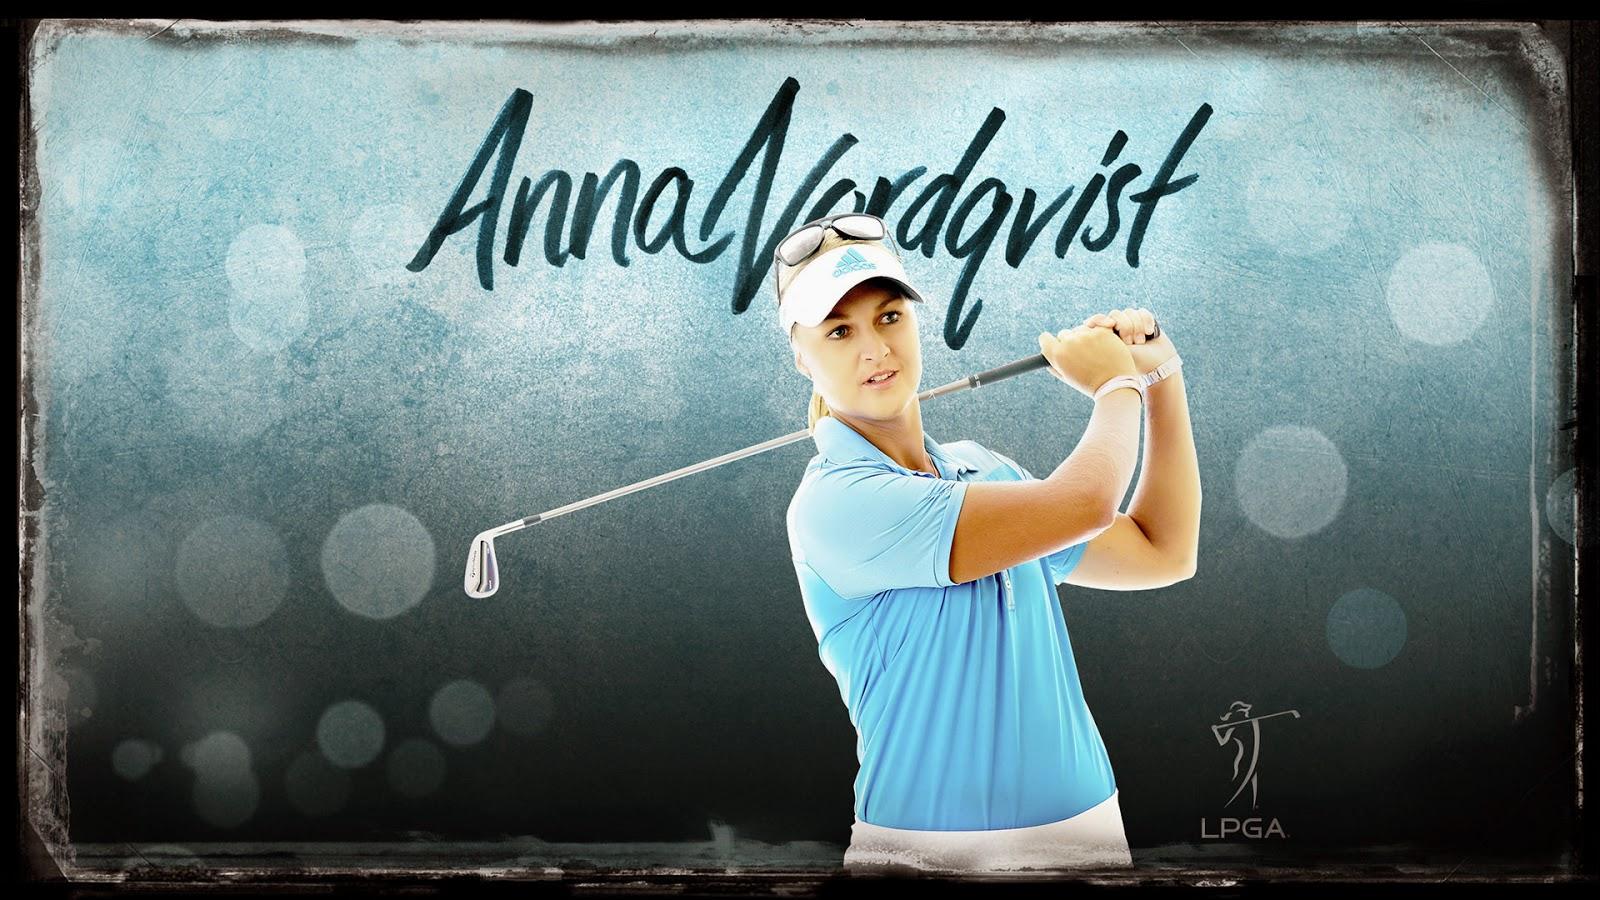 Anna-Nordqvist-LPGA-Wallpaper-2014